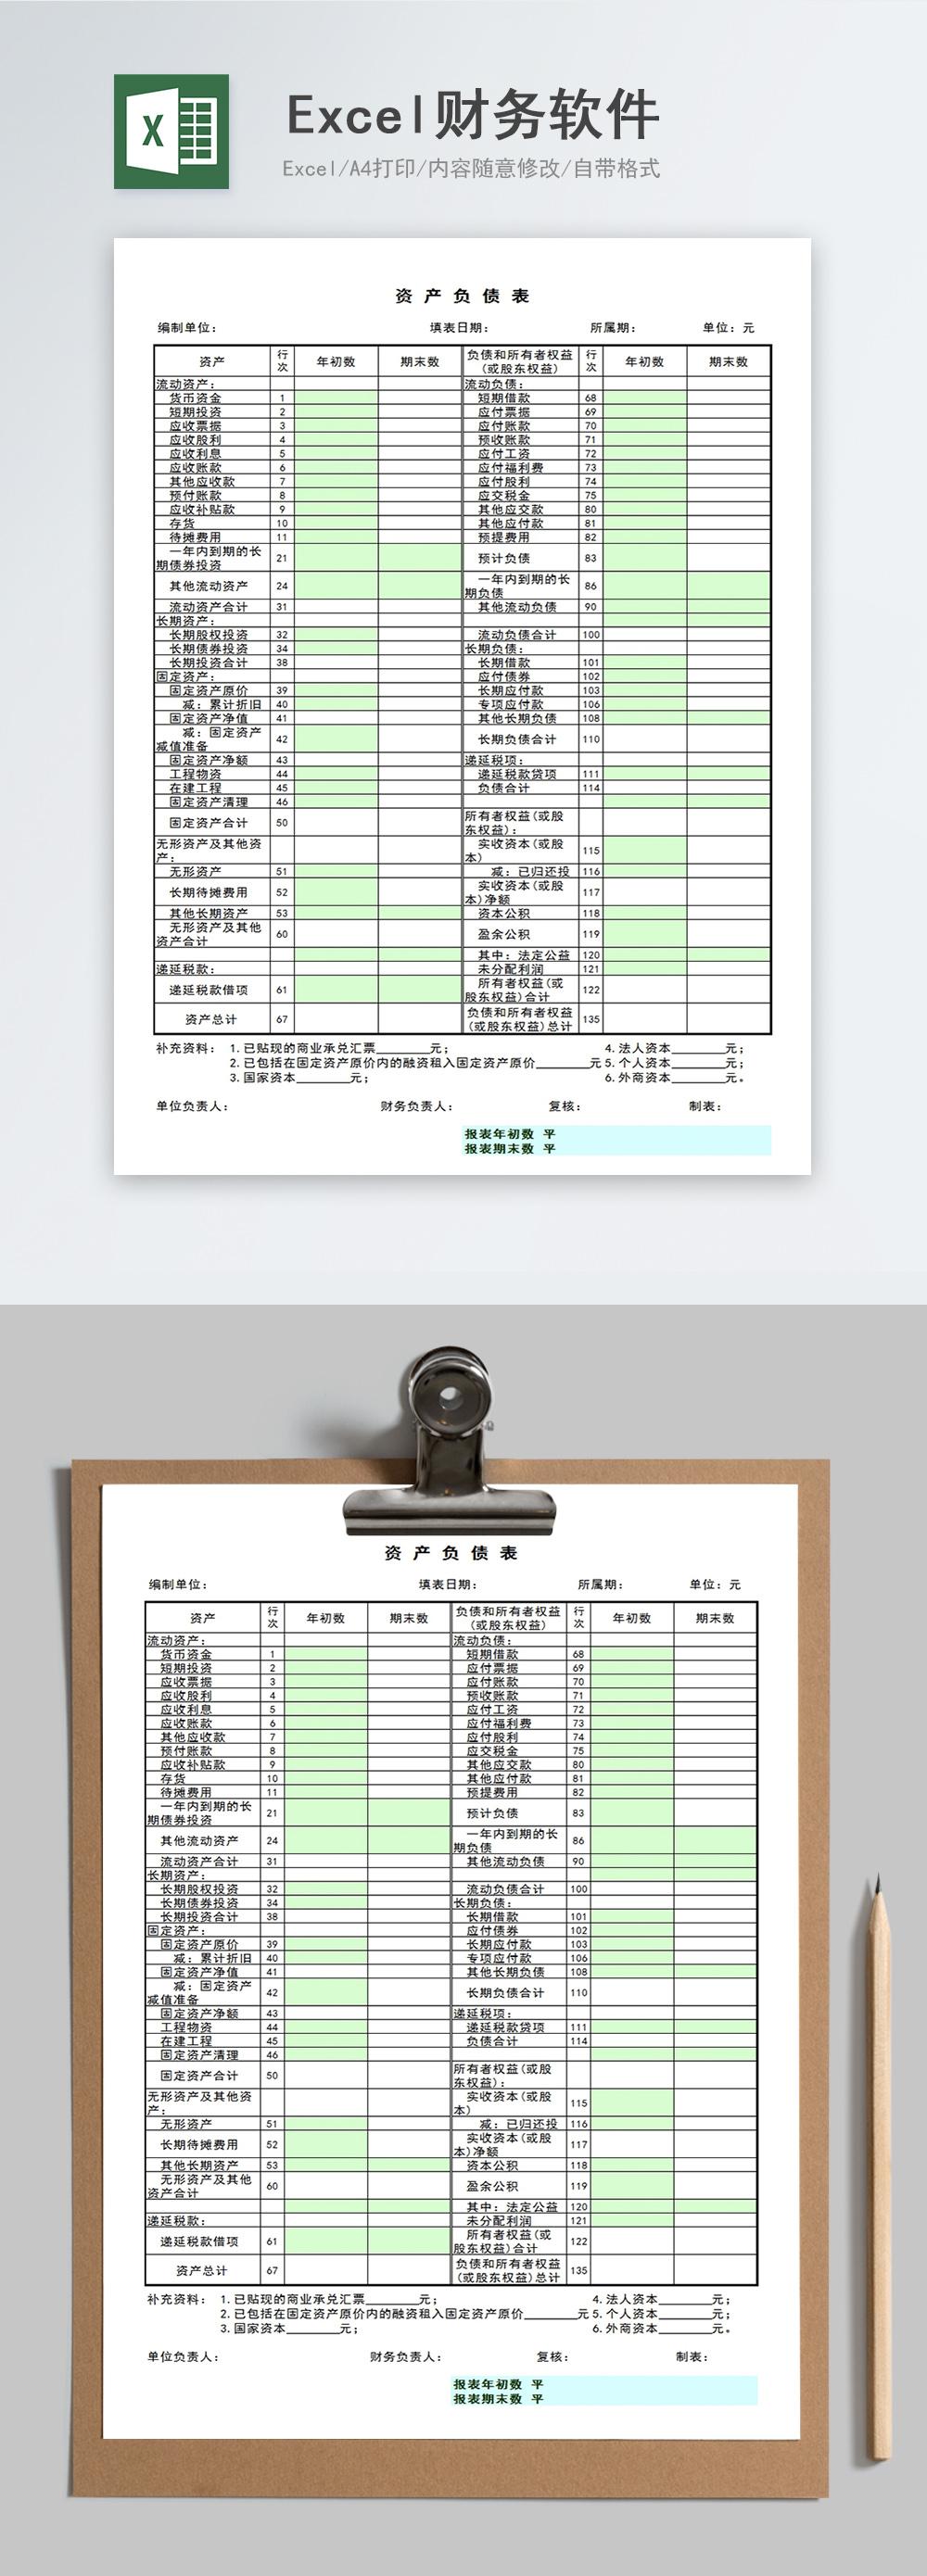 Template Balance Sheet from img.lovepik.com